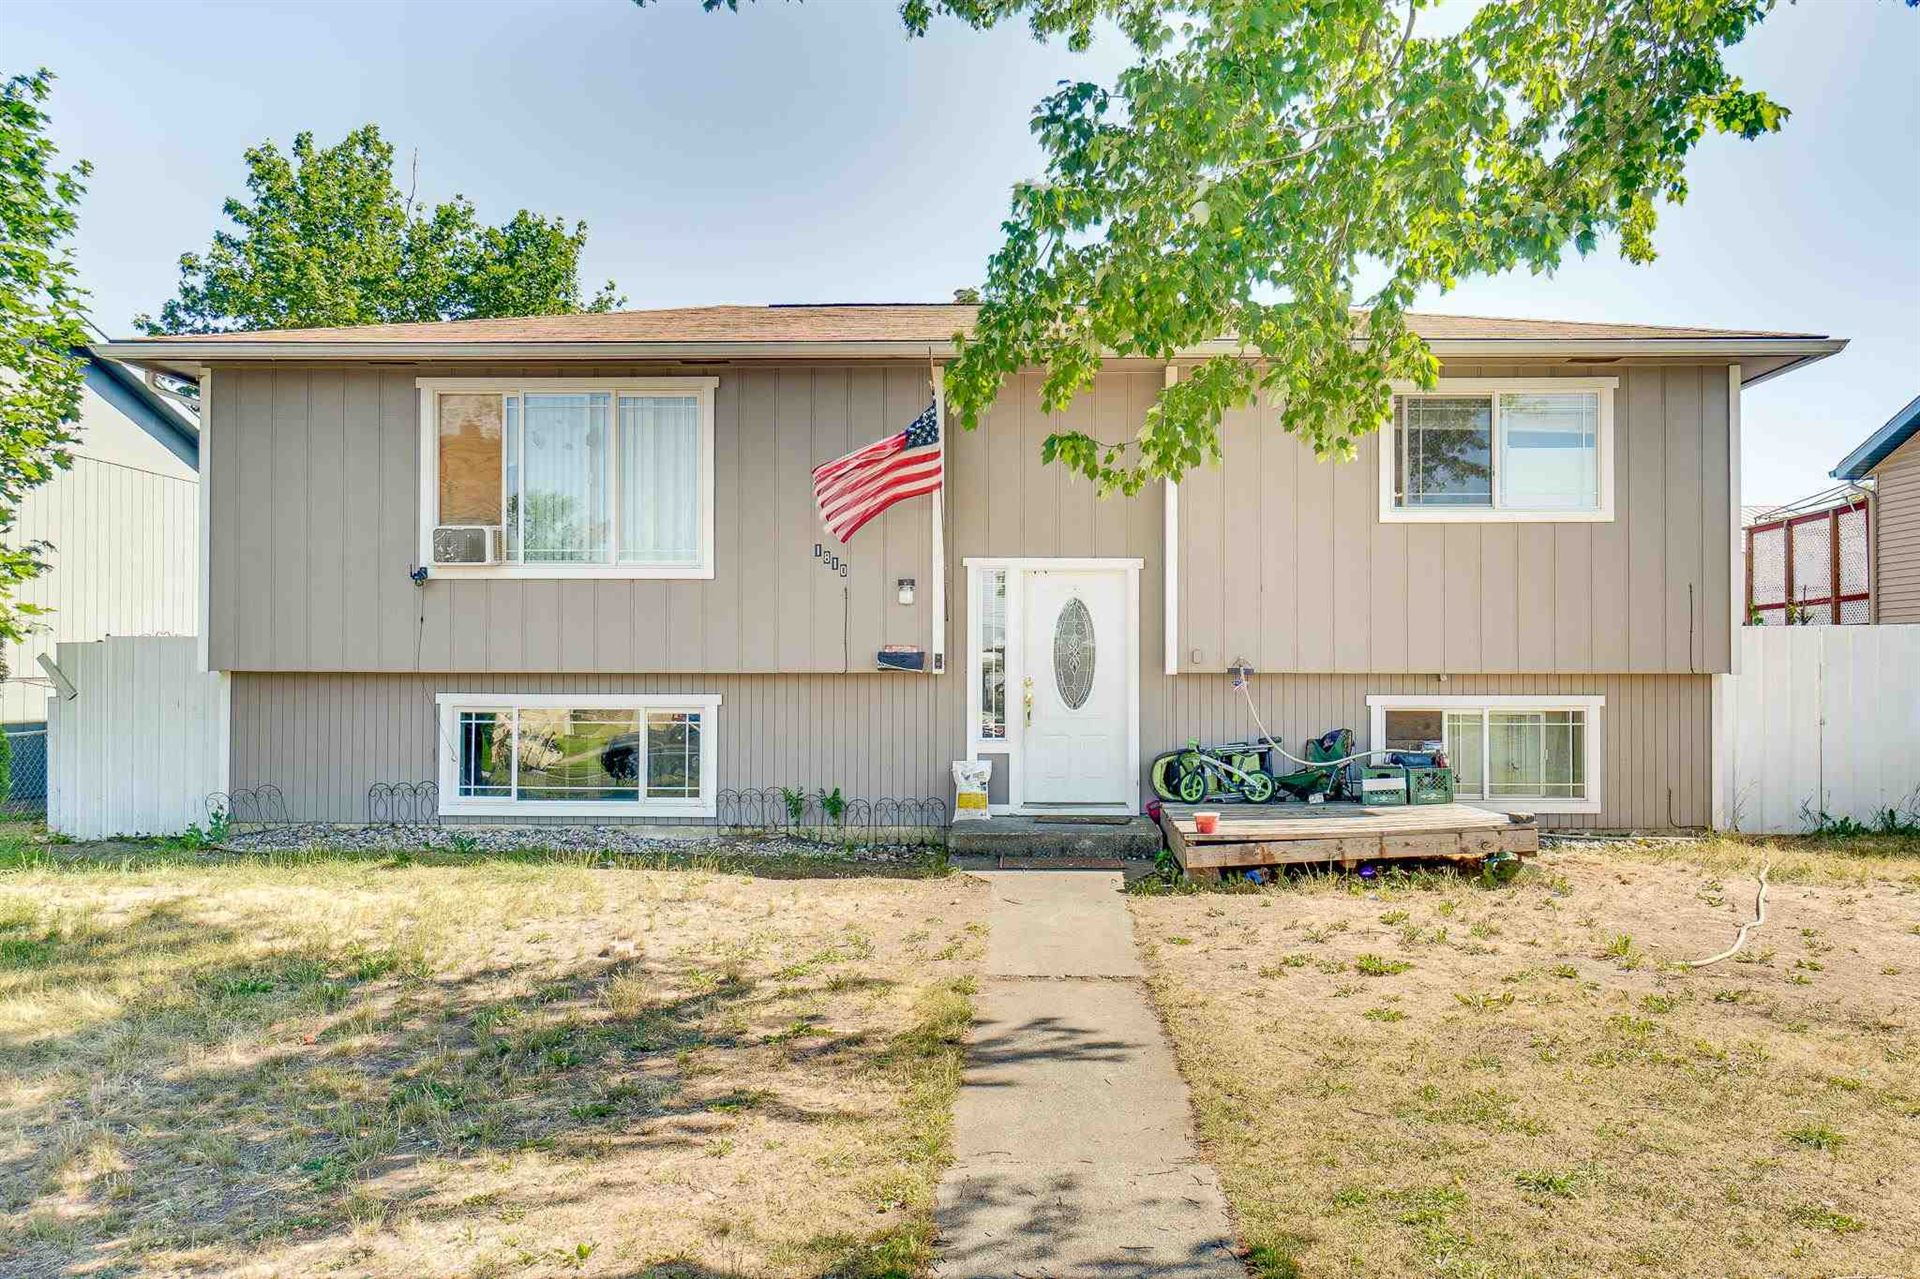 1810 E Nebraska Ave, Spokane, WA 99208 - #: 202116684